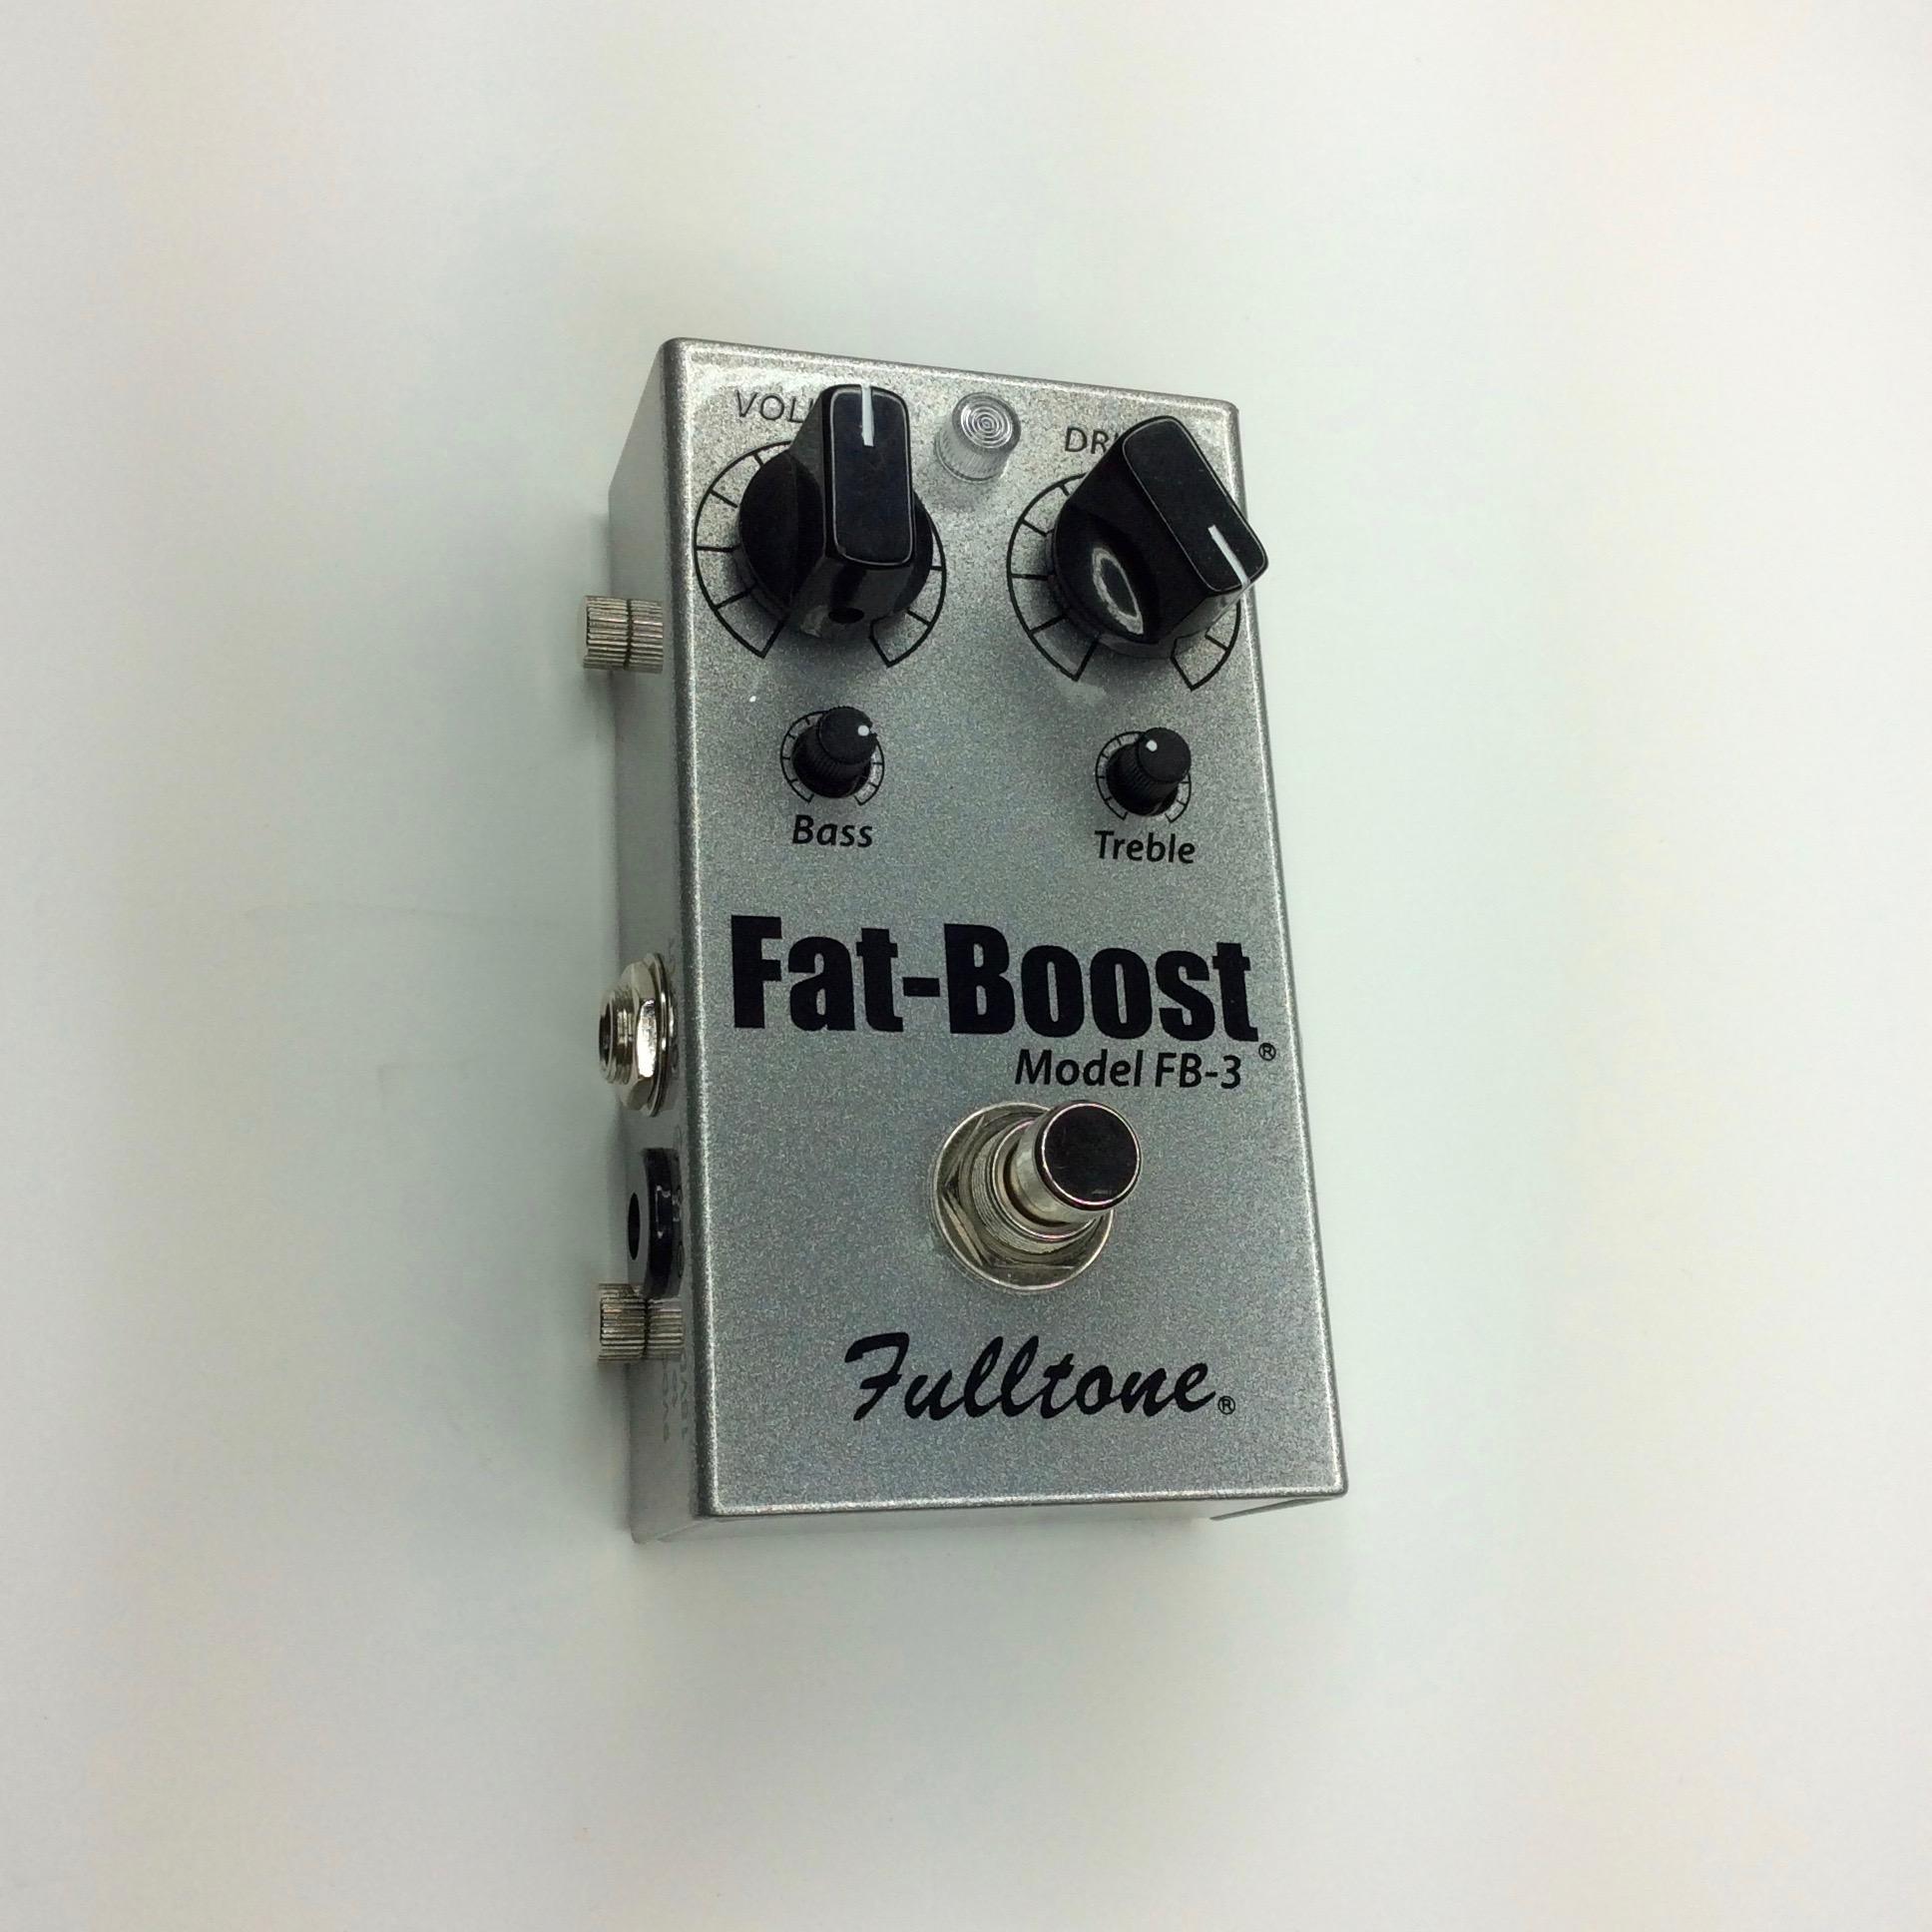 Fat-Boost Model FB-3  Make: Fulltone